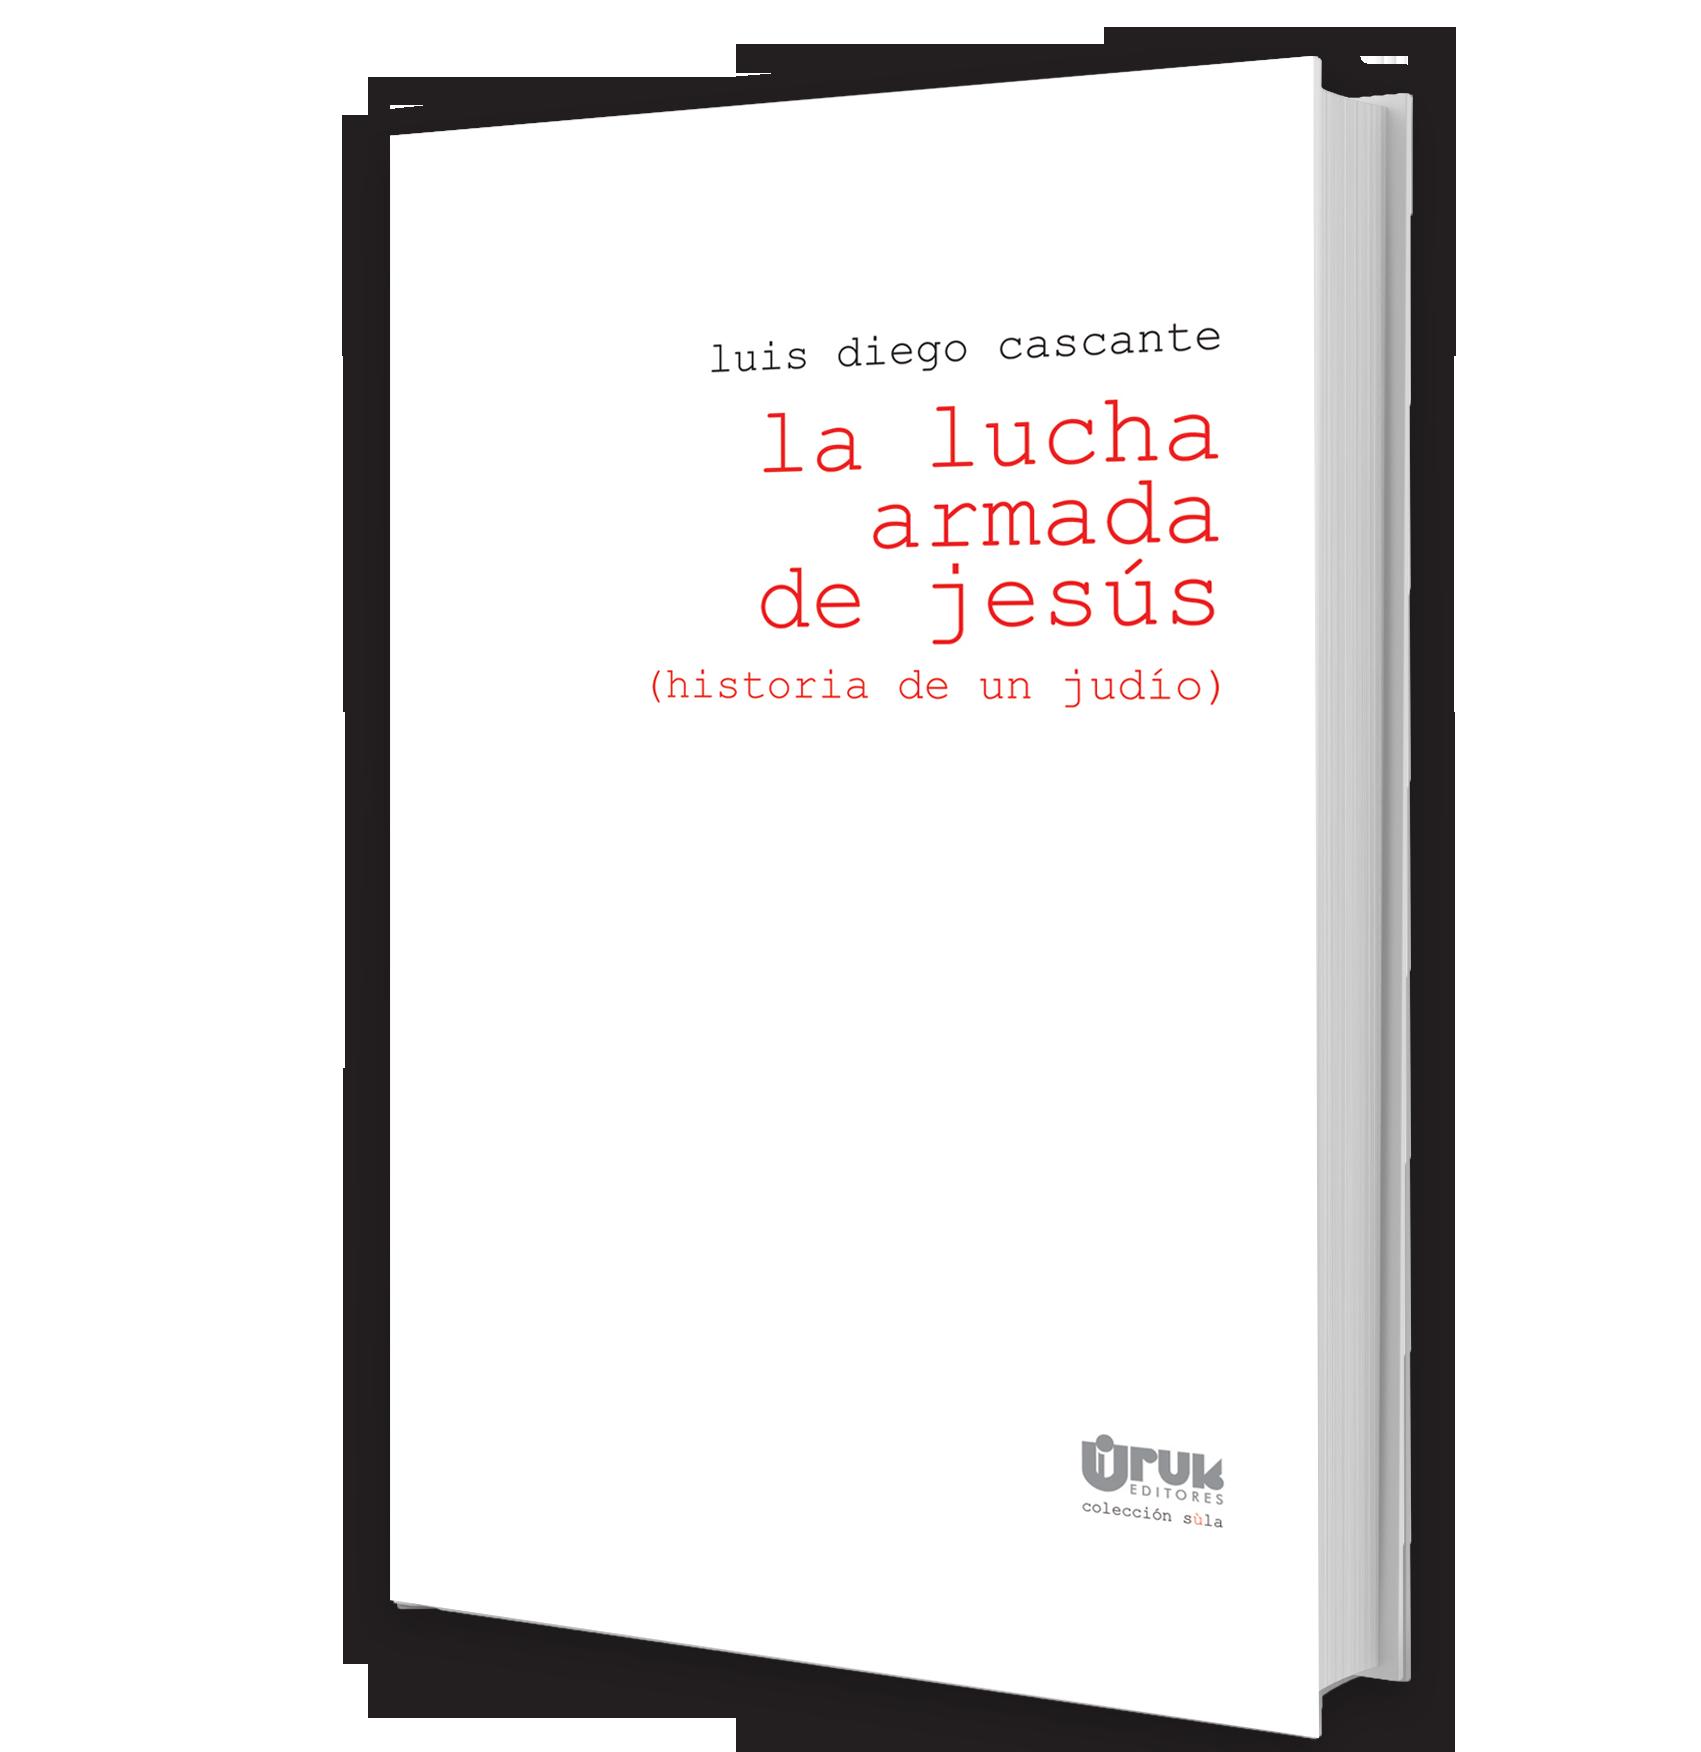 La lucha armada de Jesús